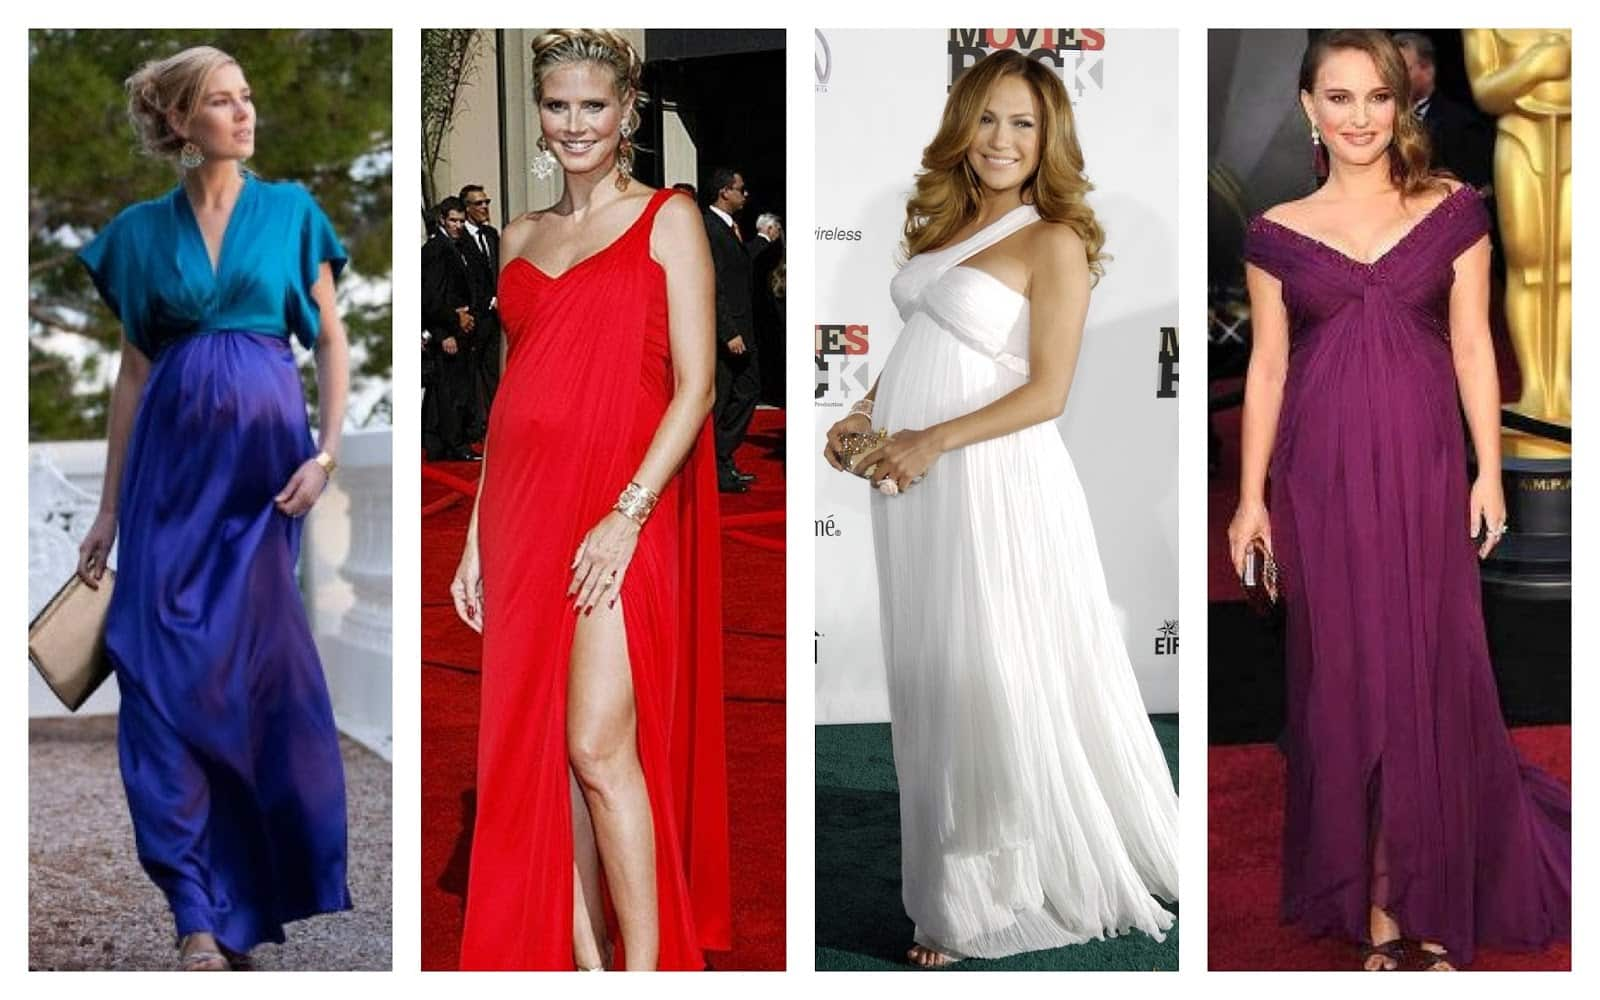 Vestidos para bodas para mujeres embarazadas